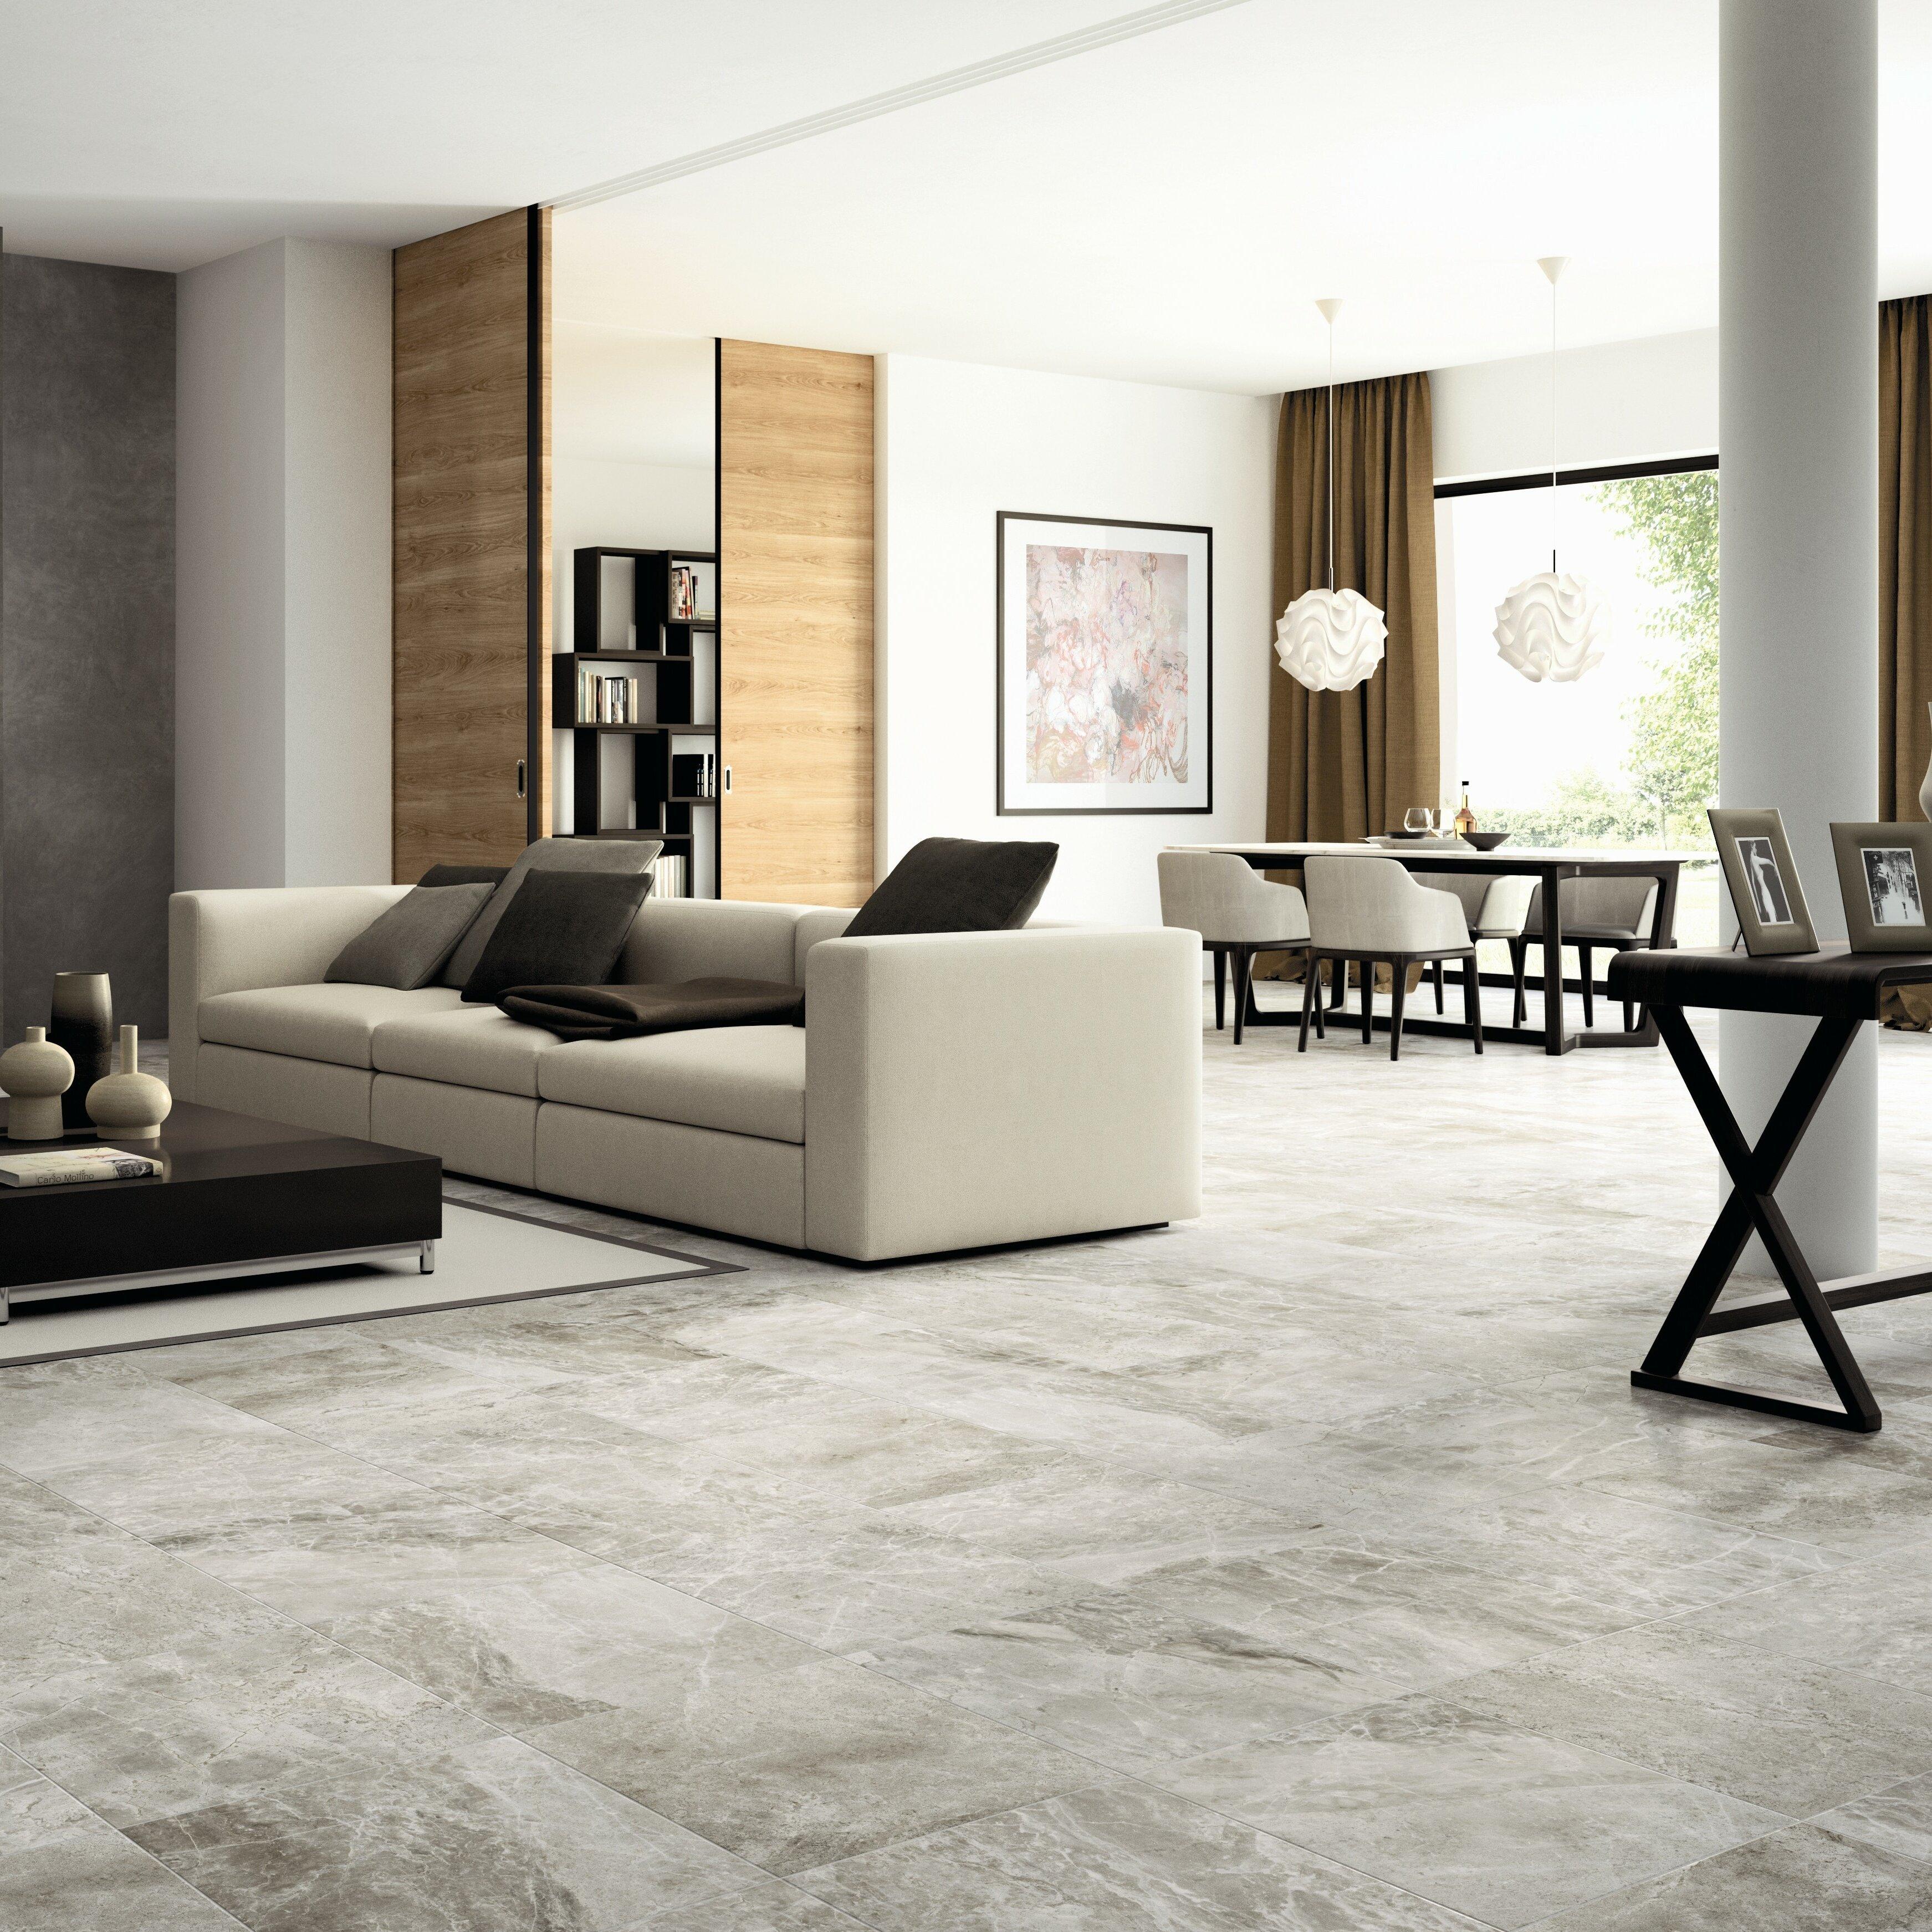 lea ceramiche emperor 12 x 12 porcelain field tile in. Black Bedroom Furniture Sets. Home Design Ideas